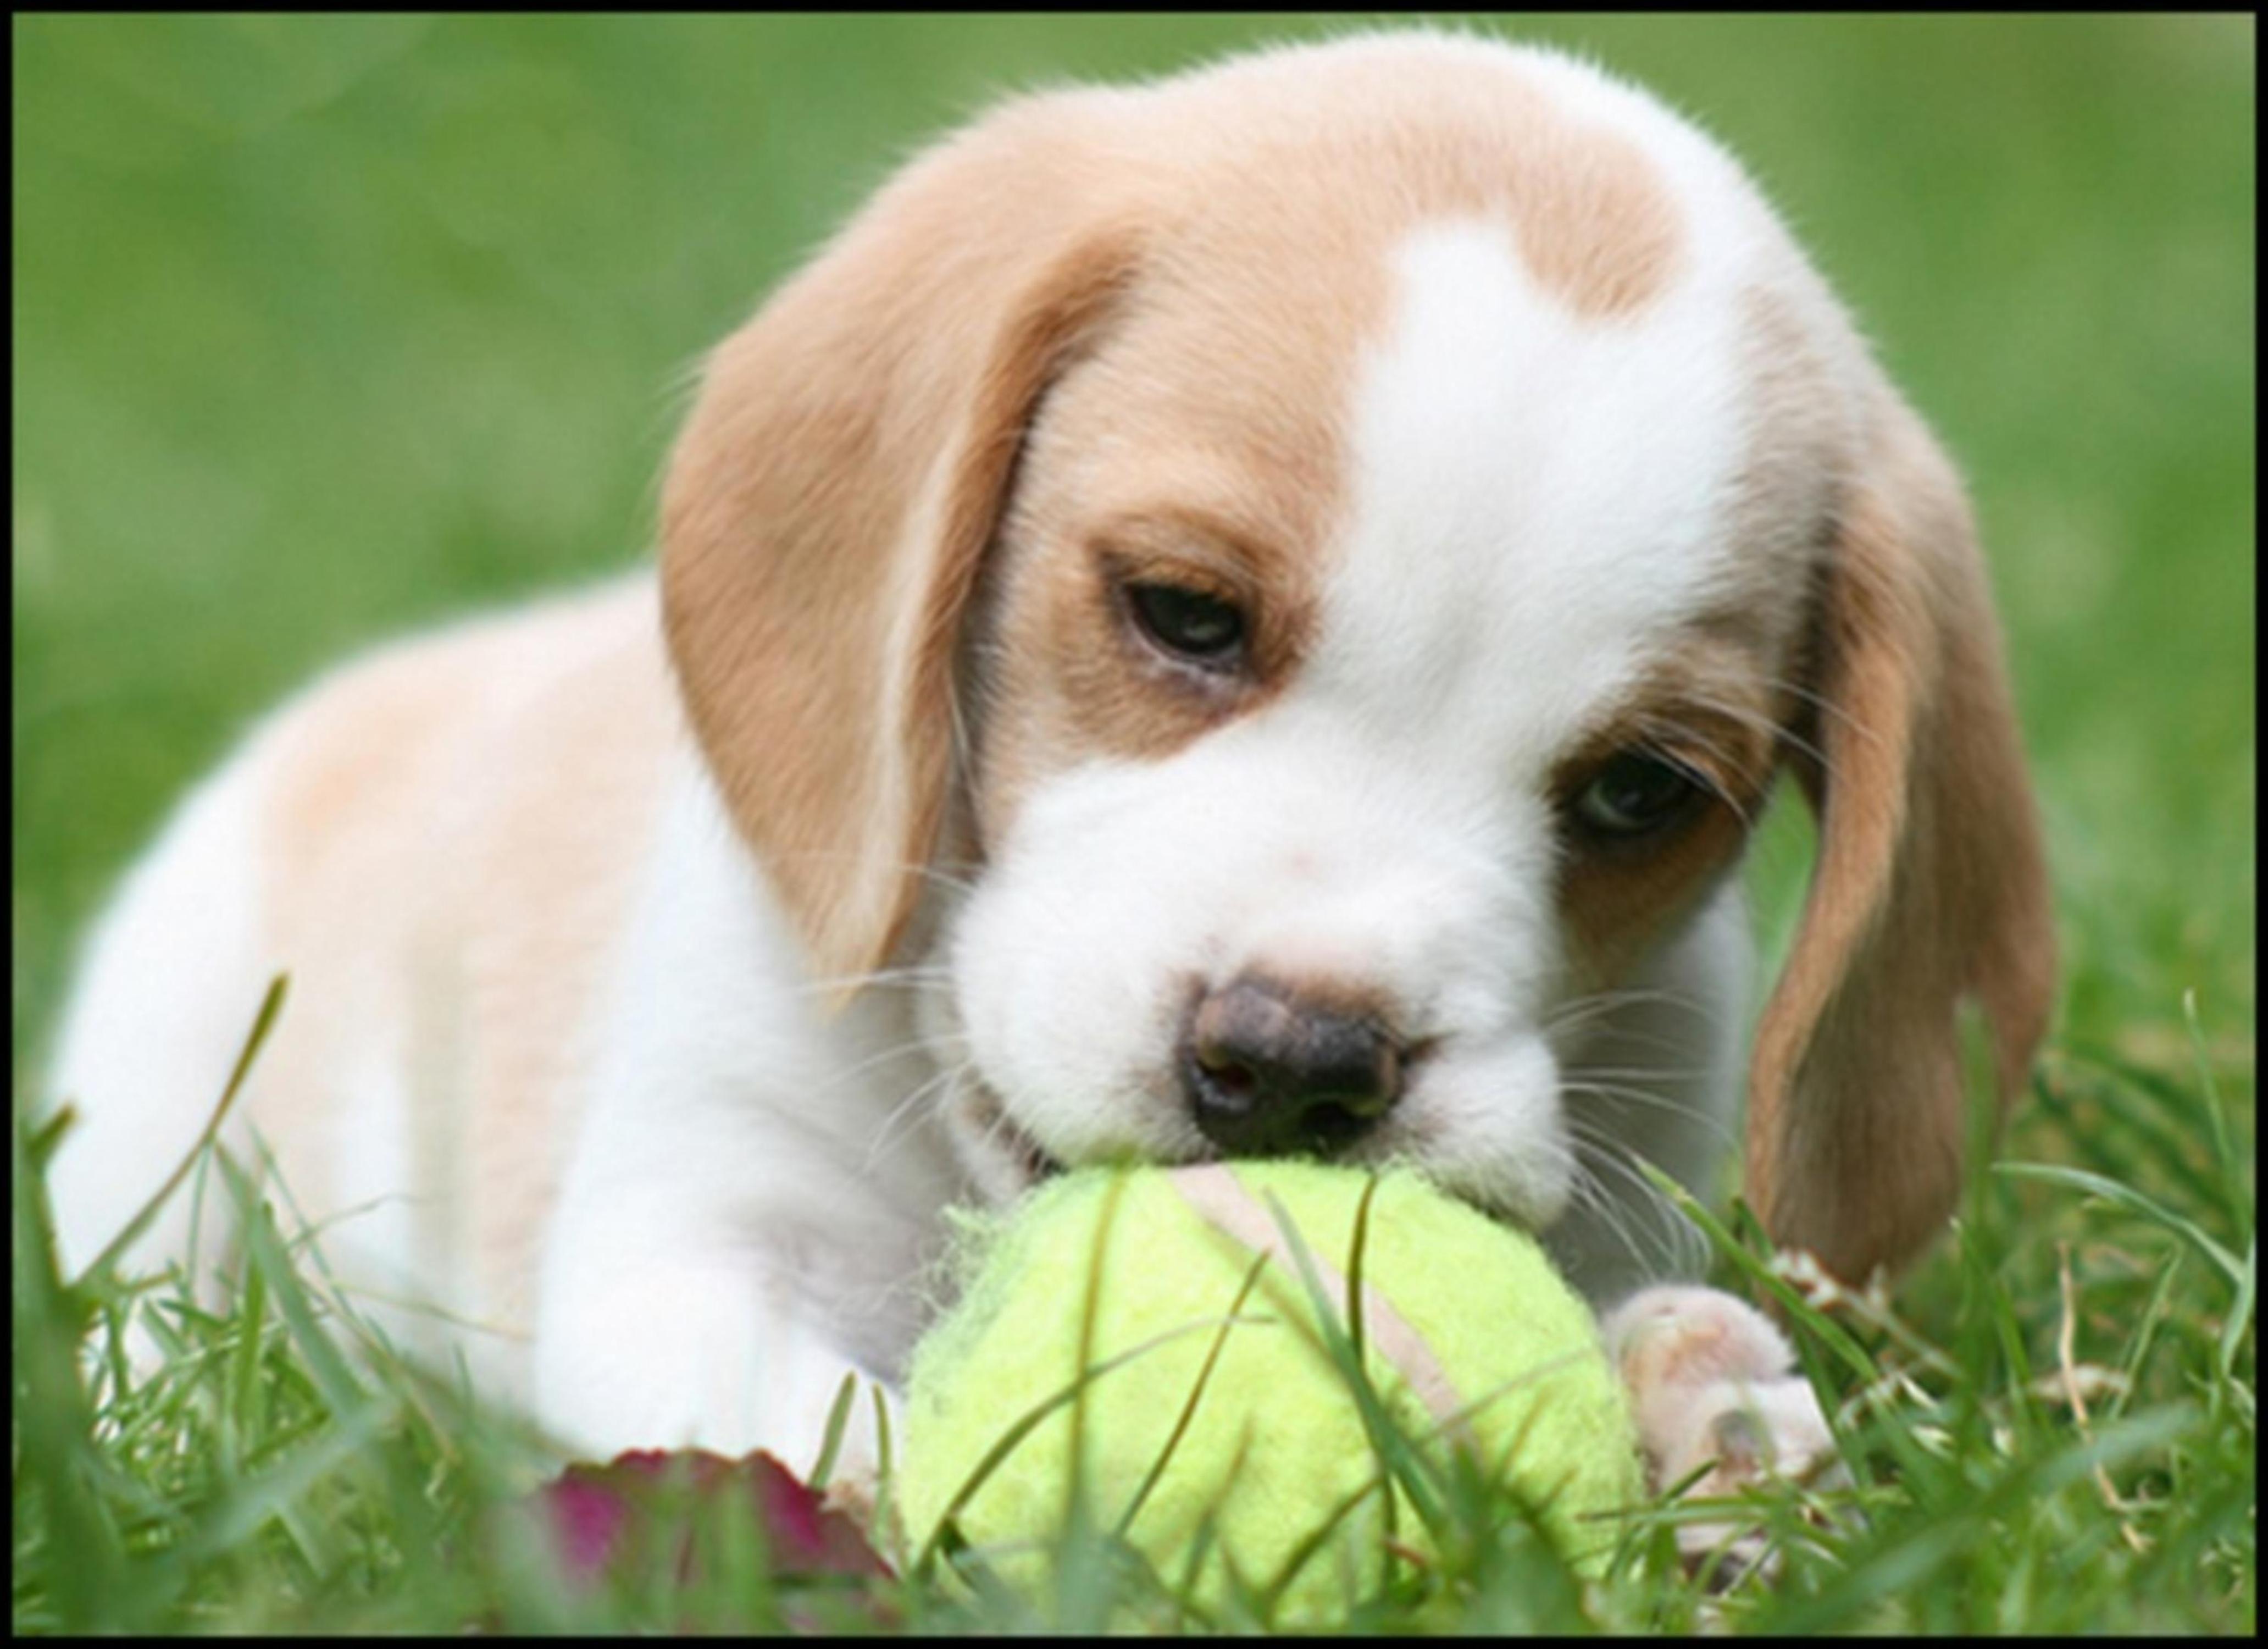 Lemon Beagle Puppy Beaglepuppycutest Beagle Puppy Cute Beagles Lemon Beagle Puppy